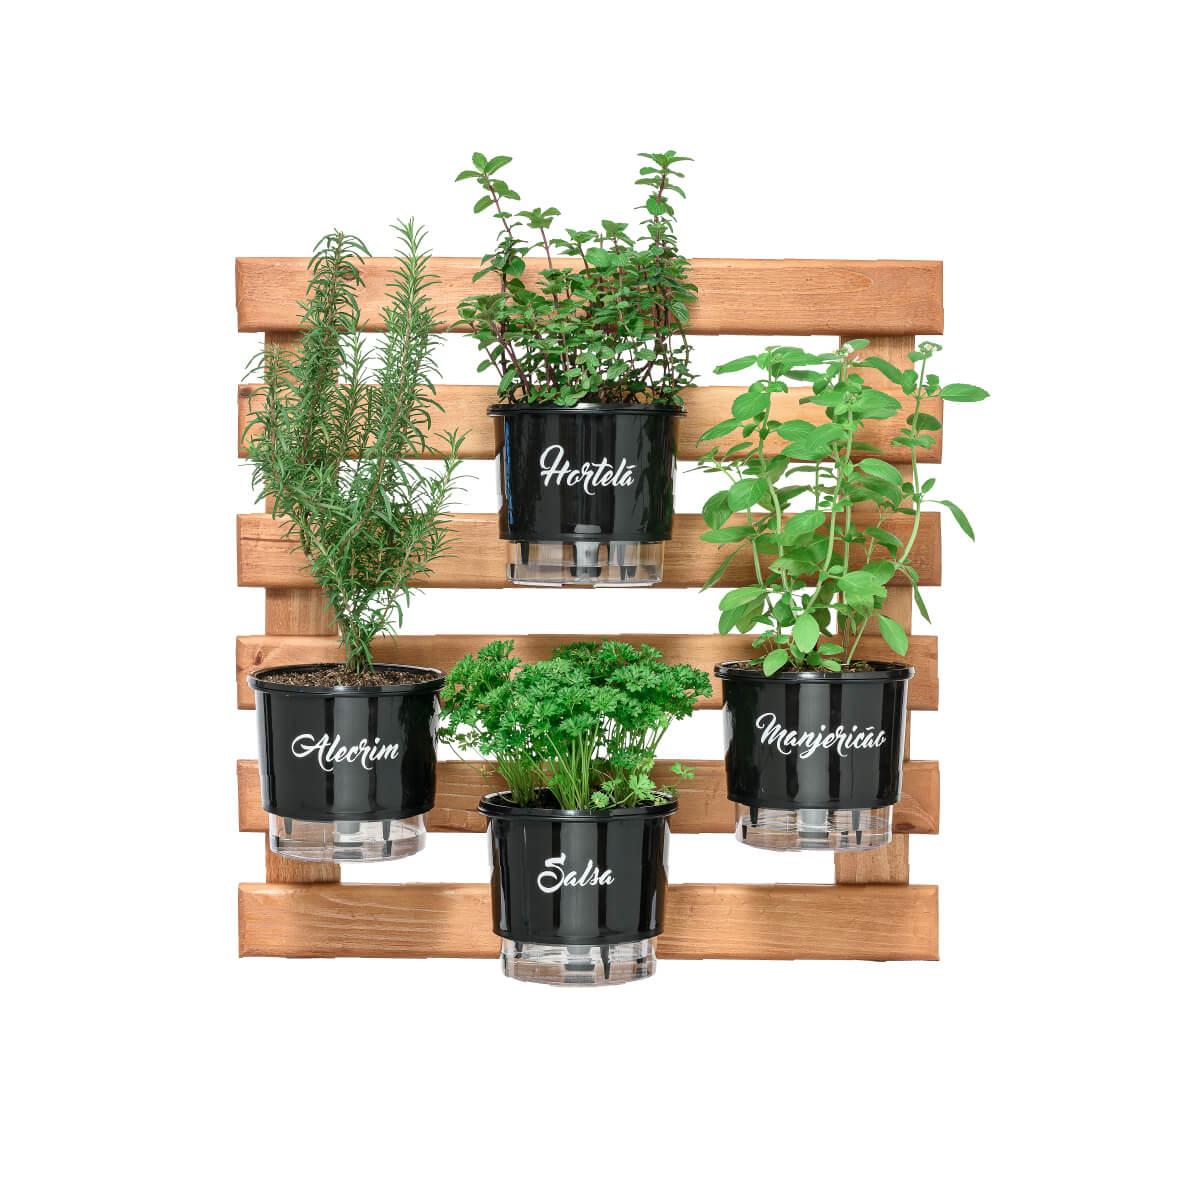 Kit Horta Vertical Gourmet 60cm x 60cm com 4 Vasos gourmet  - Vasos Raiz Loja Oficial